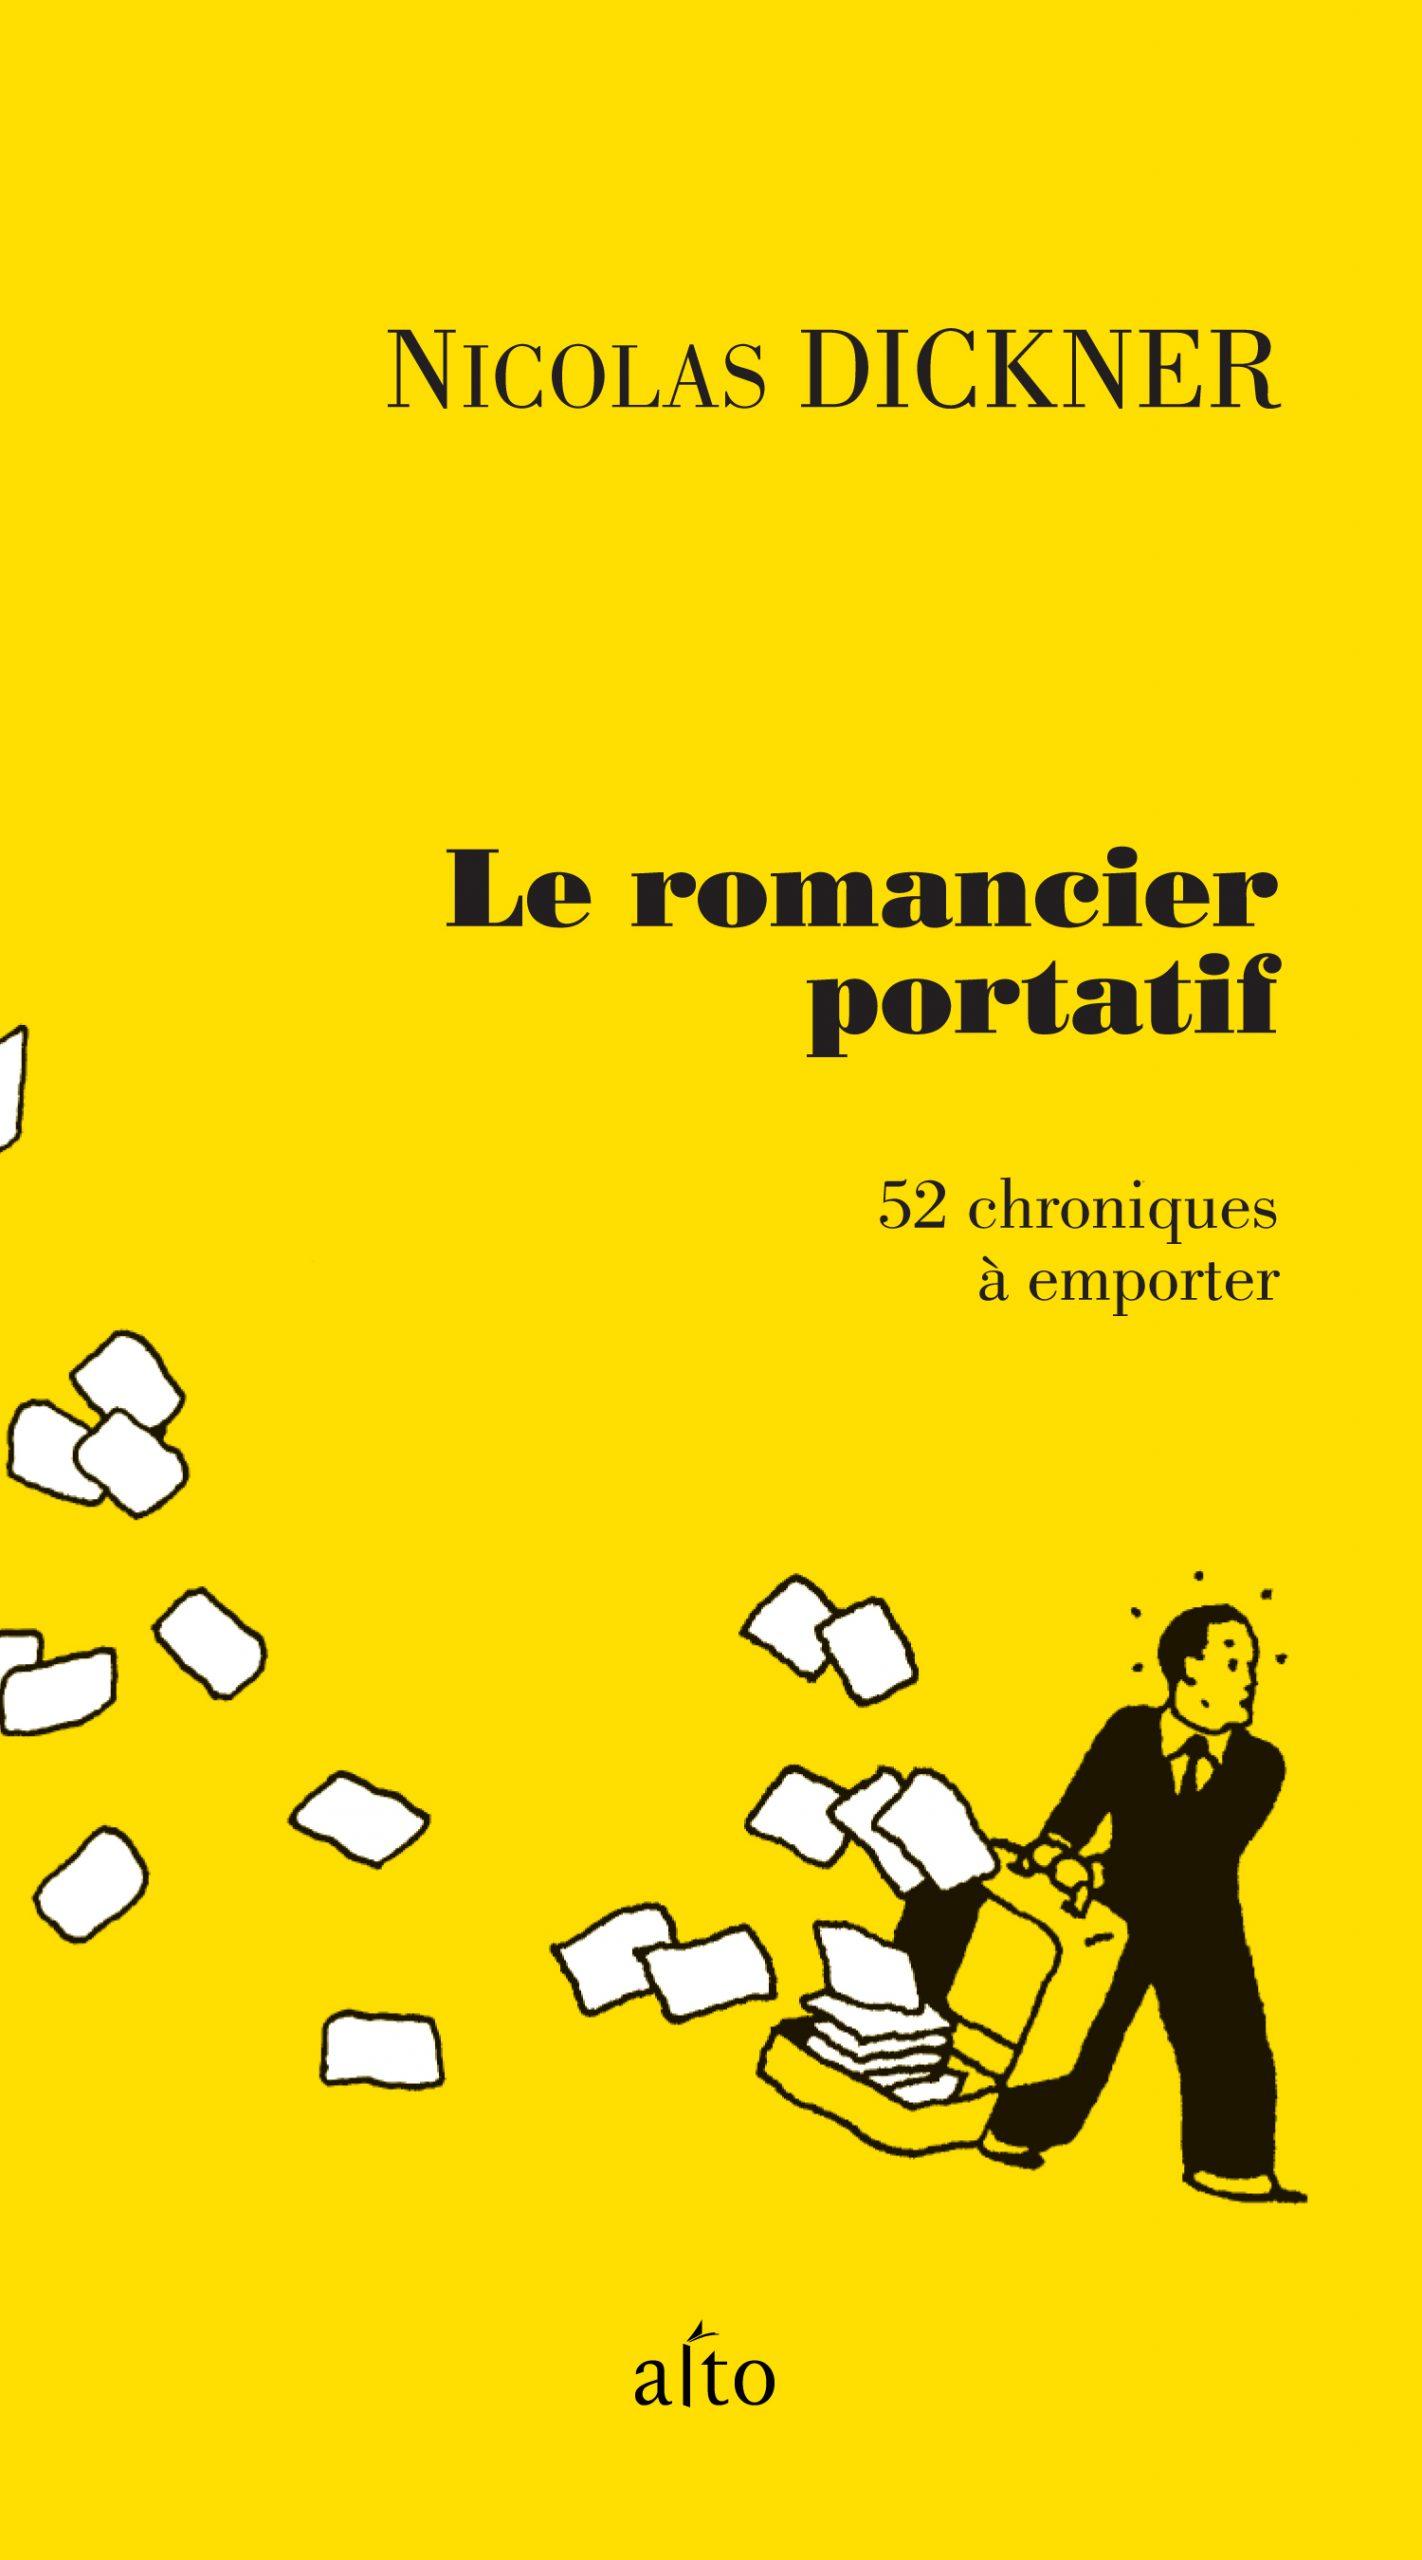 Nicolas Dickner, le Romancier portatif, 2011, couverture